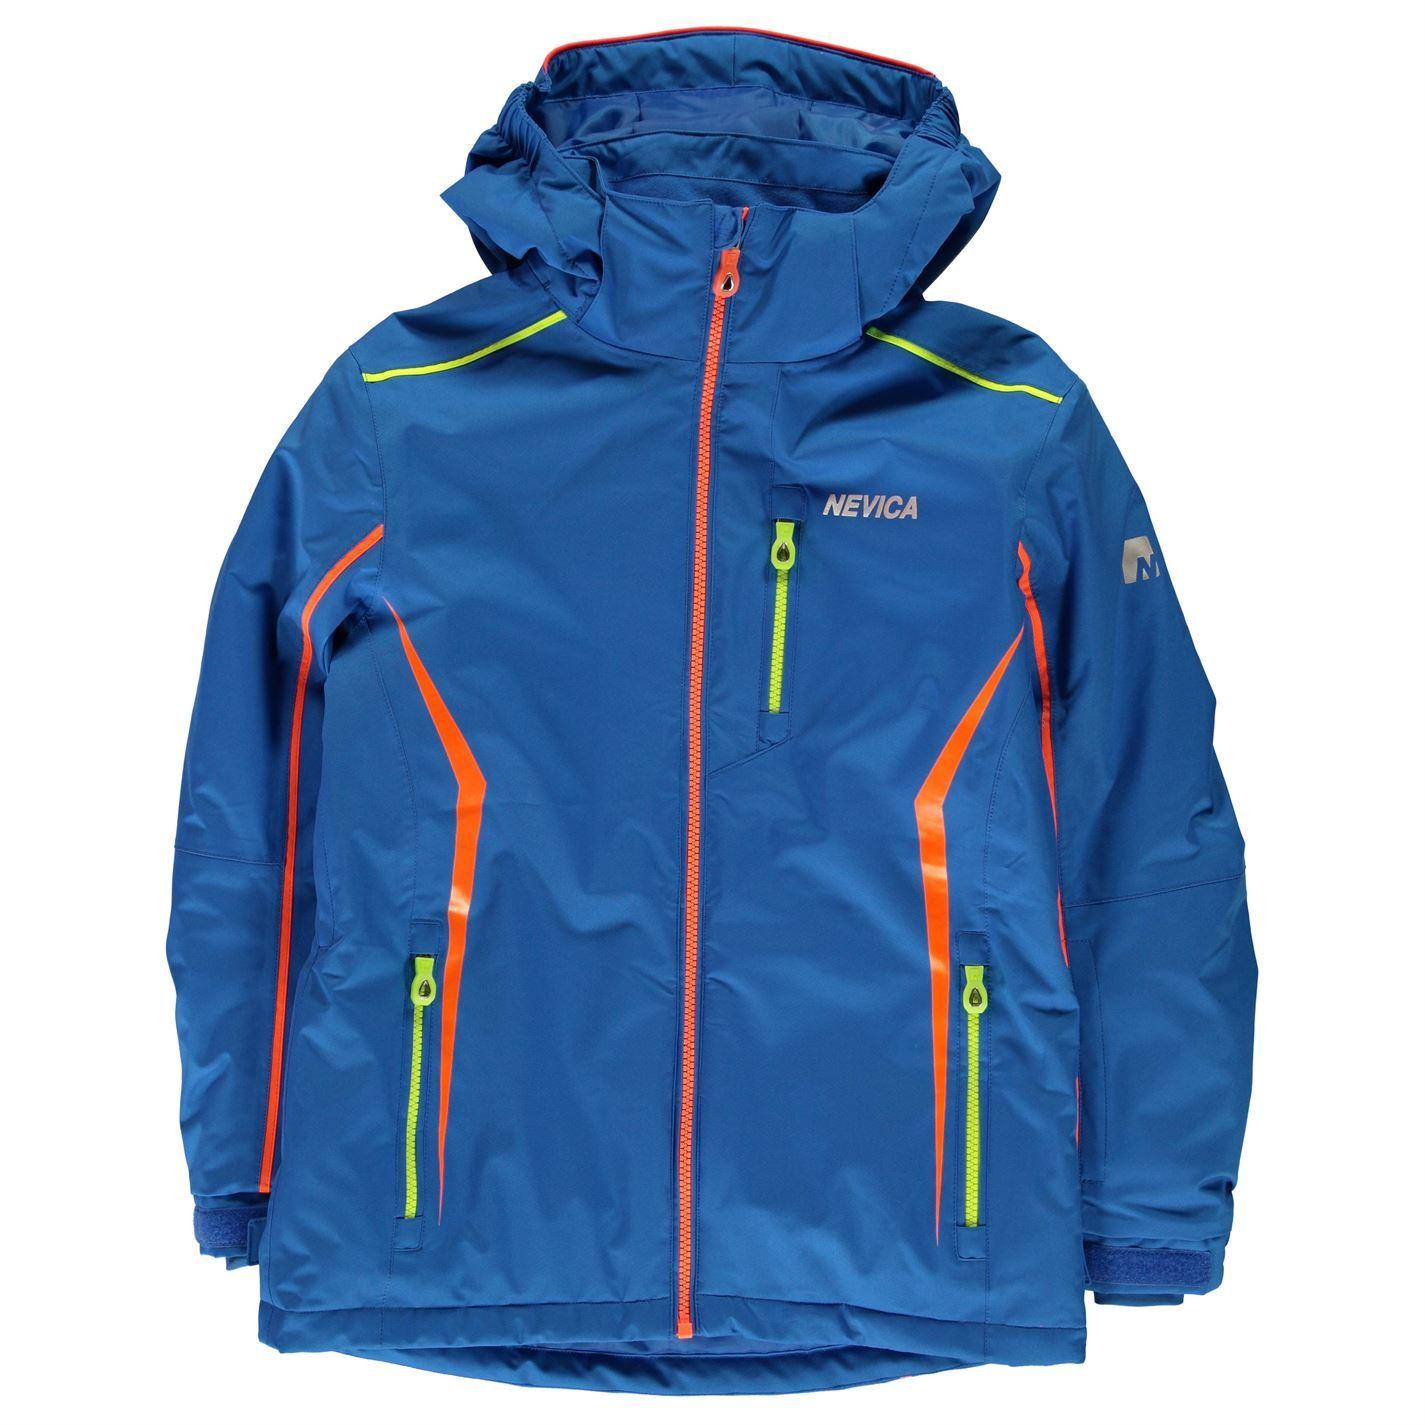 ... Nevica Meribel Jacket Junior Boys Snow Coat Skiing Outerwear 749ddfe6ddc